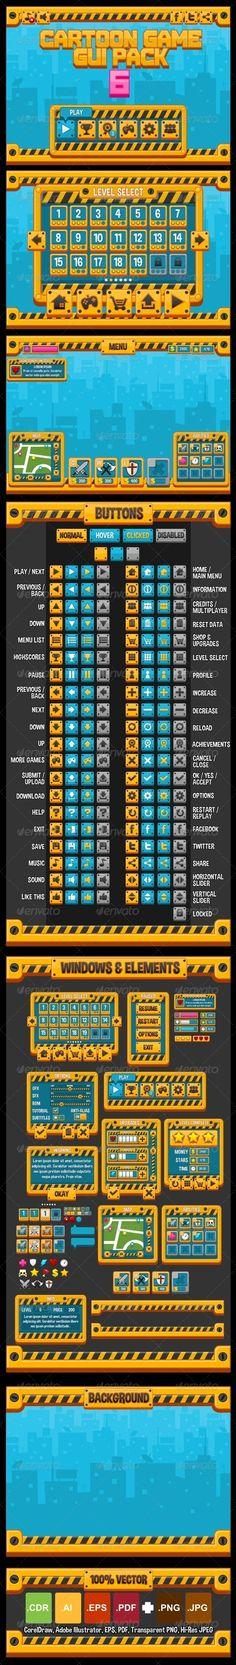 Cartoon Games GUI Pack 6 by pzUH, via Behance